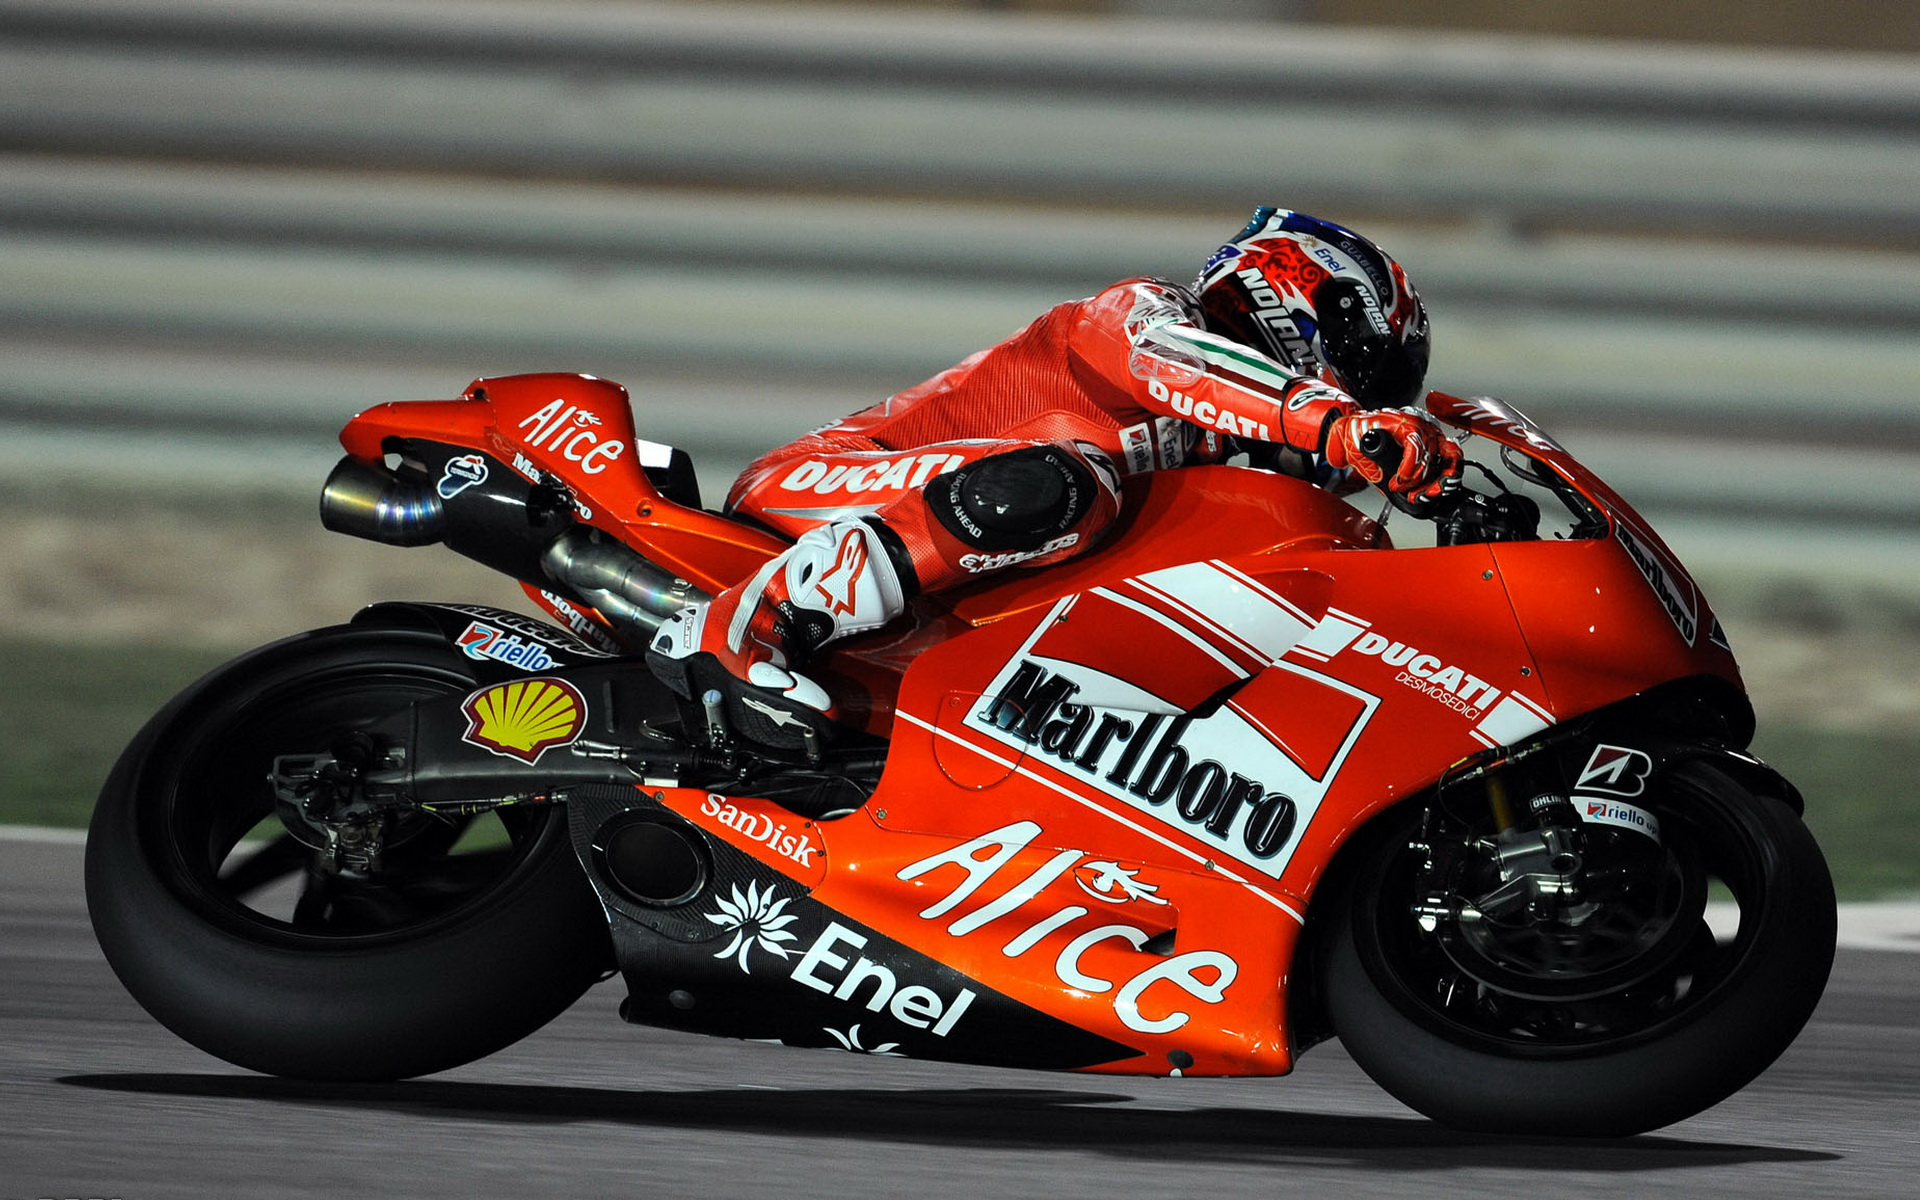 Moto Gp Ducati wallpaper   706774 1920x1200